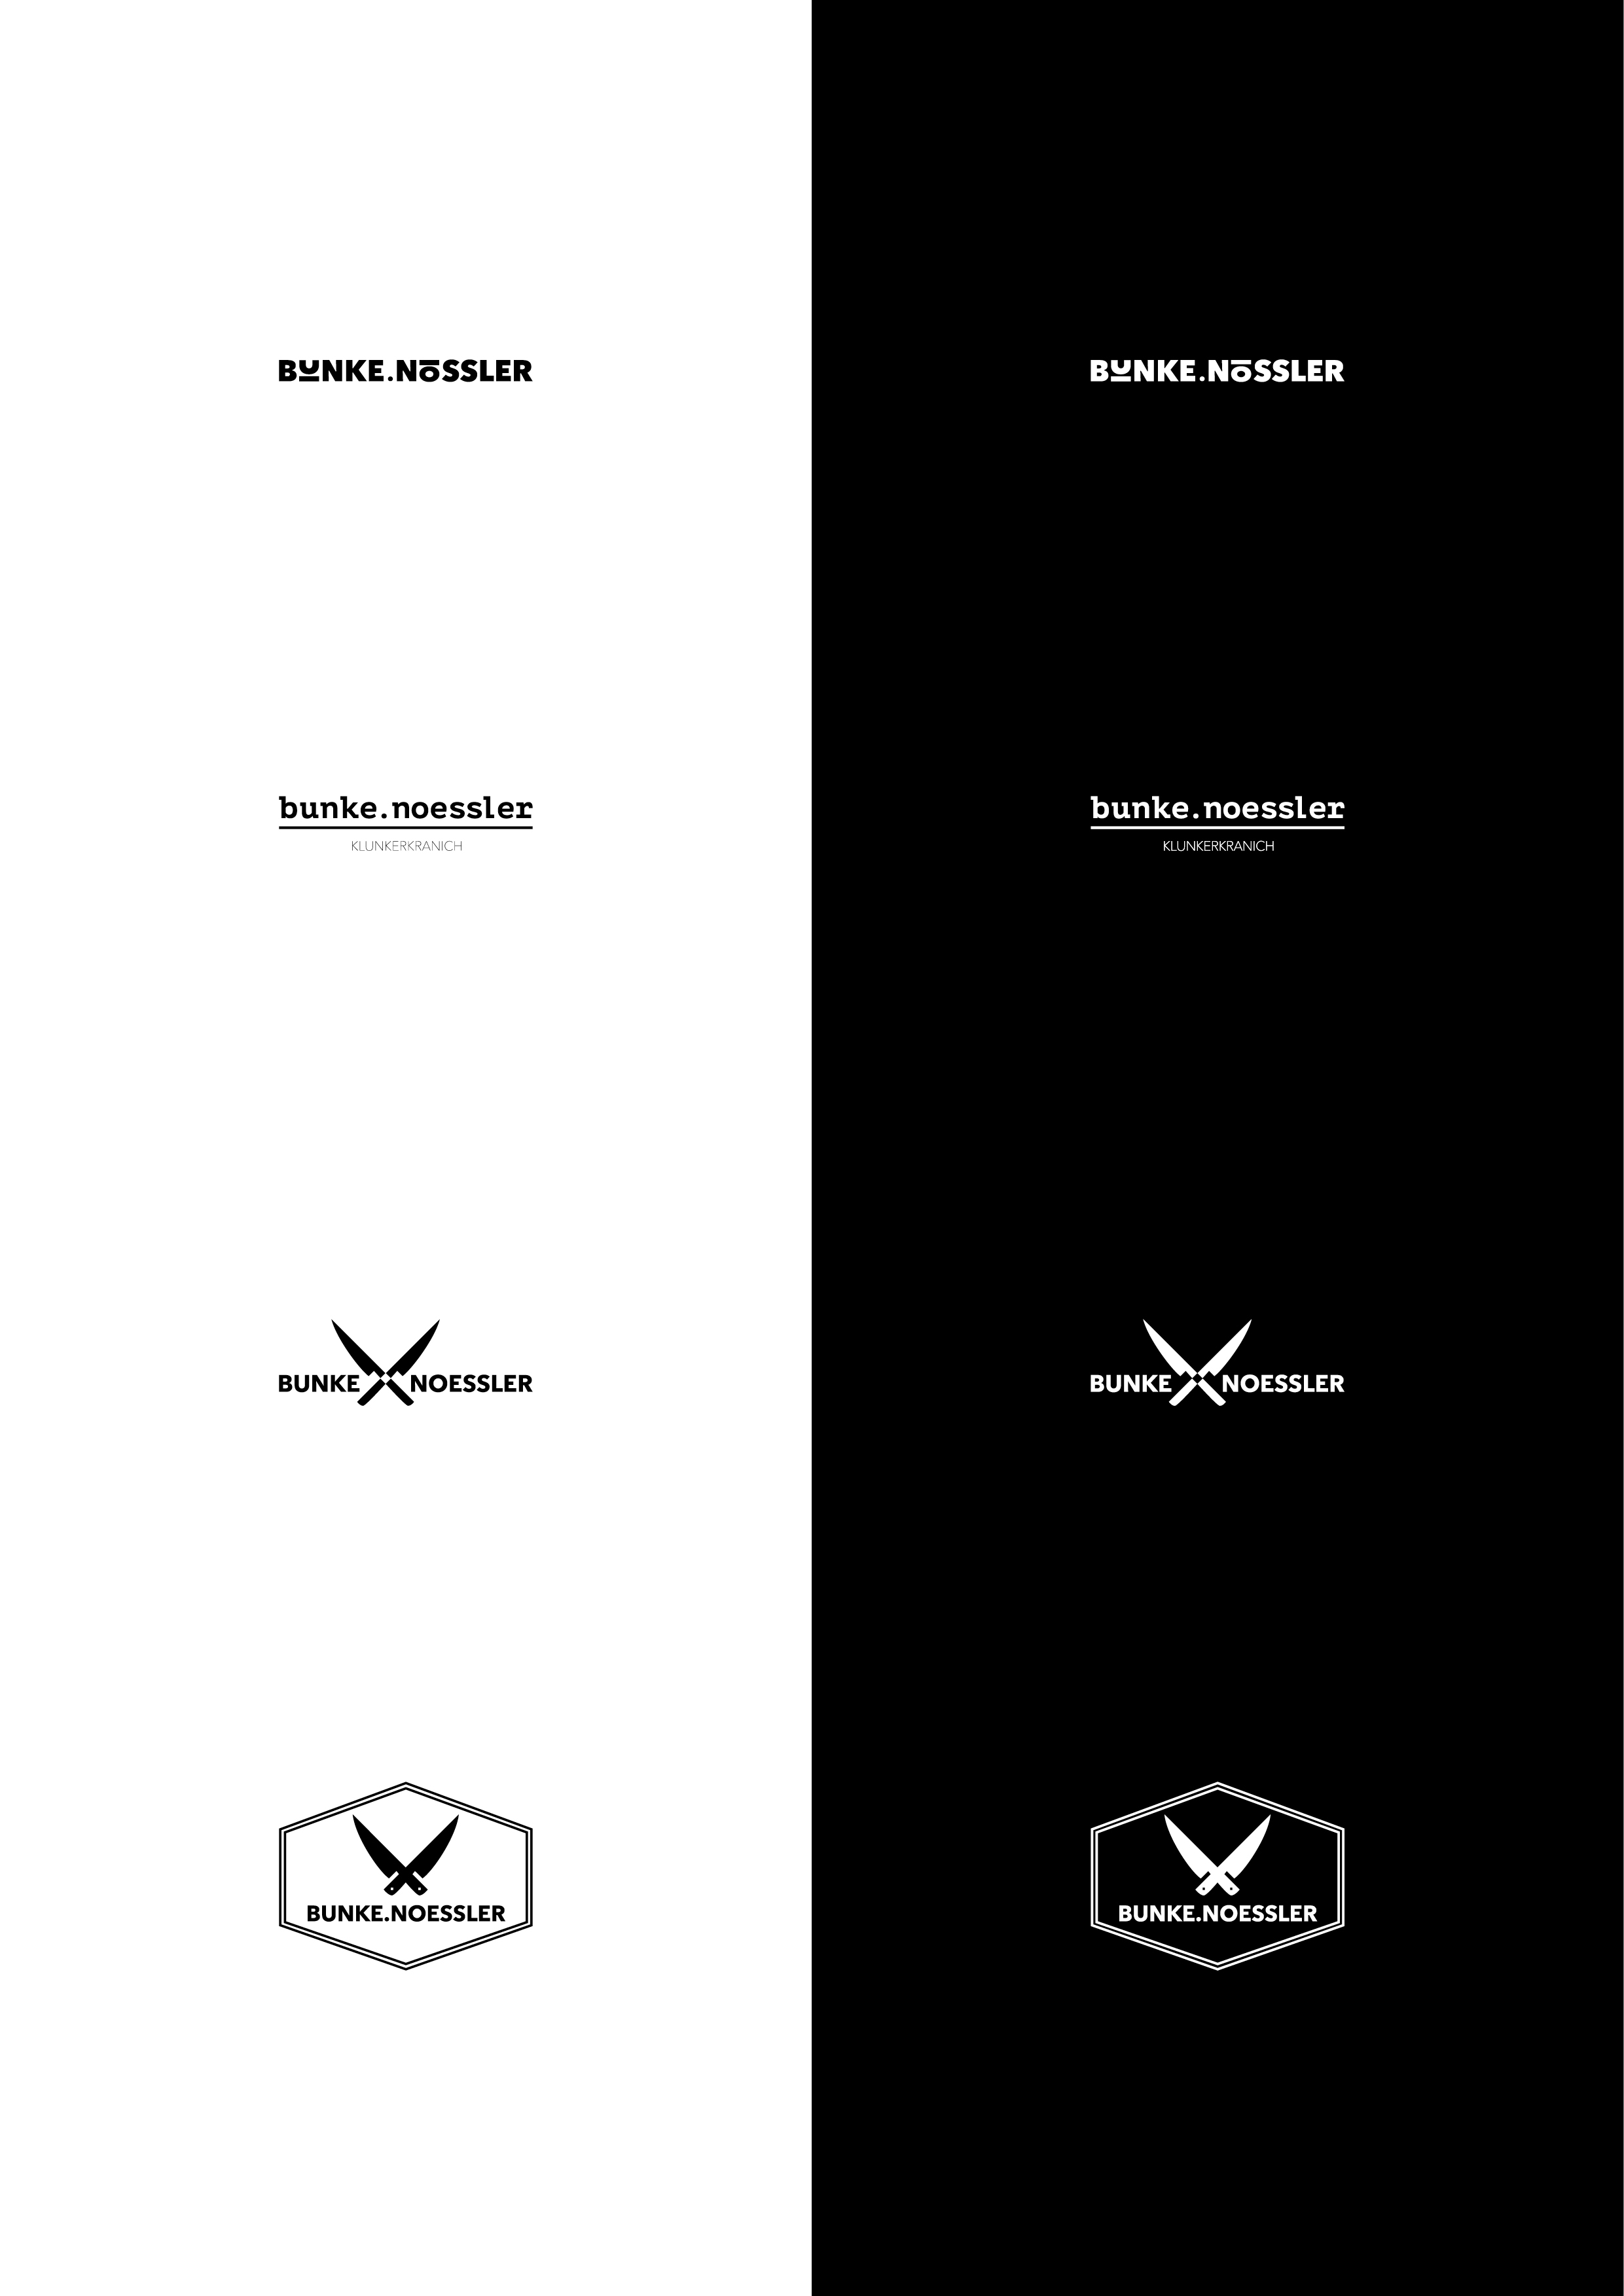 zwei1000_grafik_logo_bunke_noessler_klein